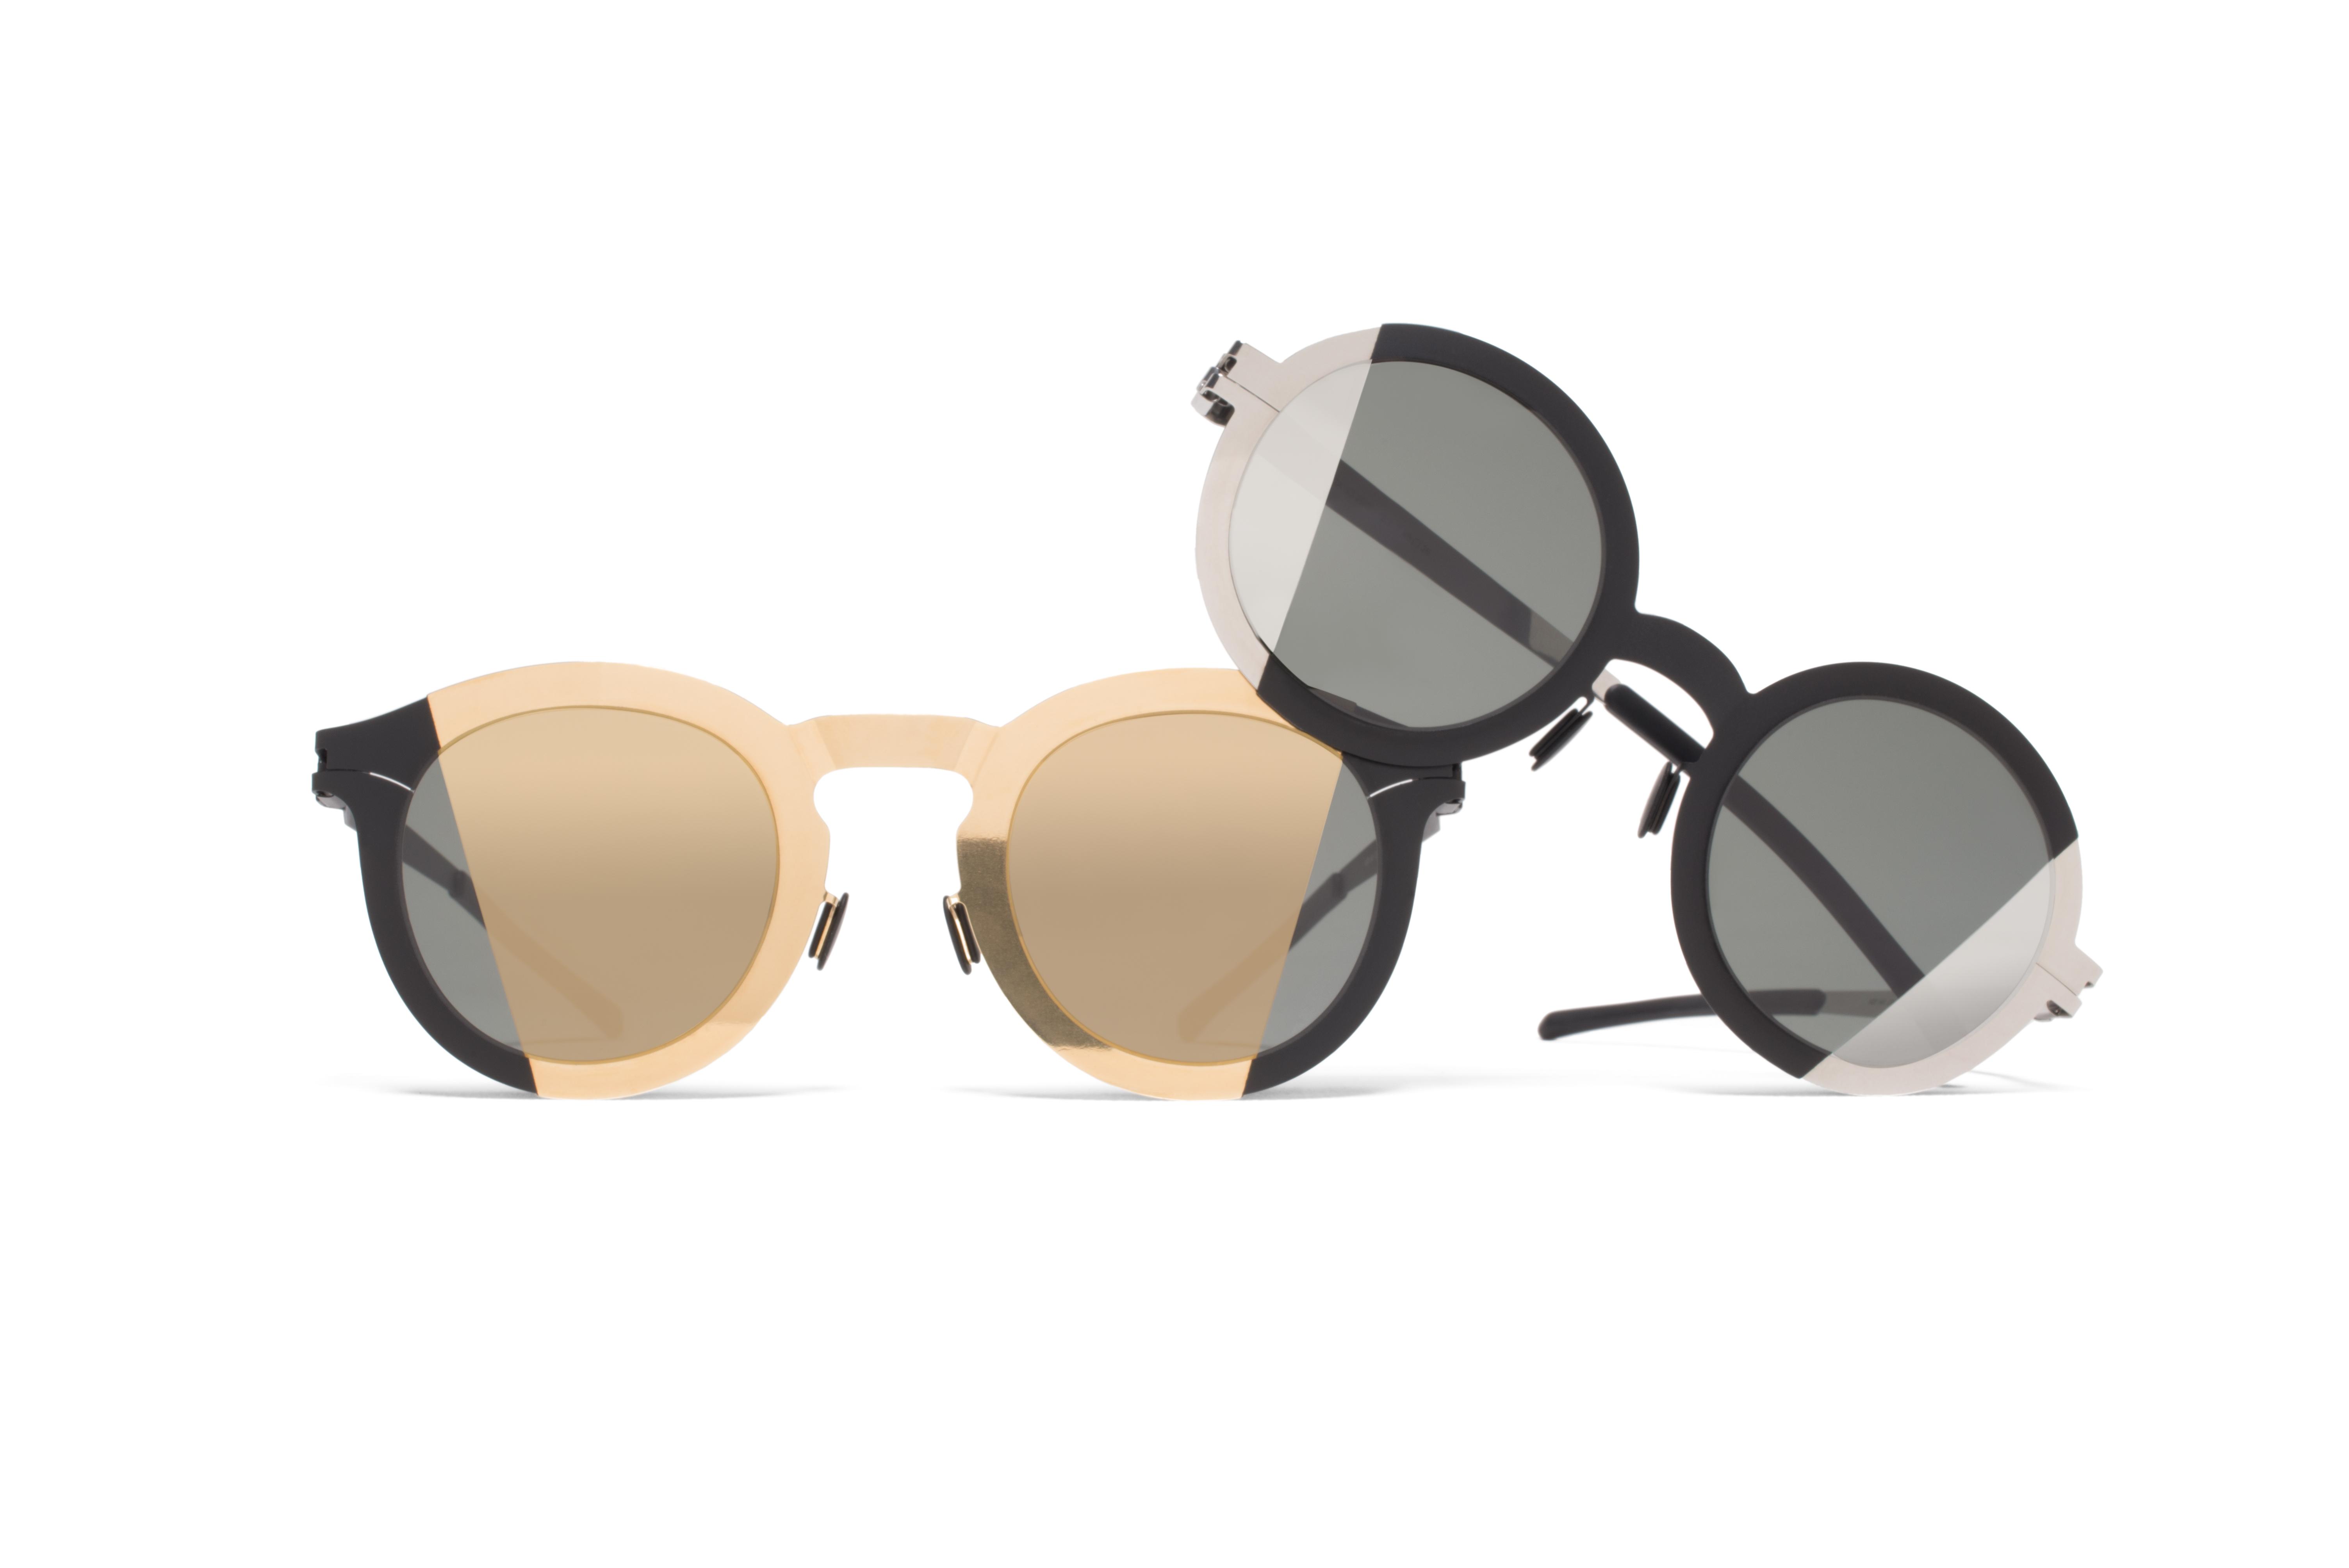 Mykita Studio 2.2 Sunglasses in Silver and Black Metal Maison Martin Margiela aXpMG9Sd